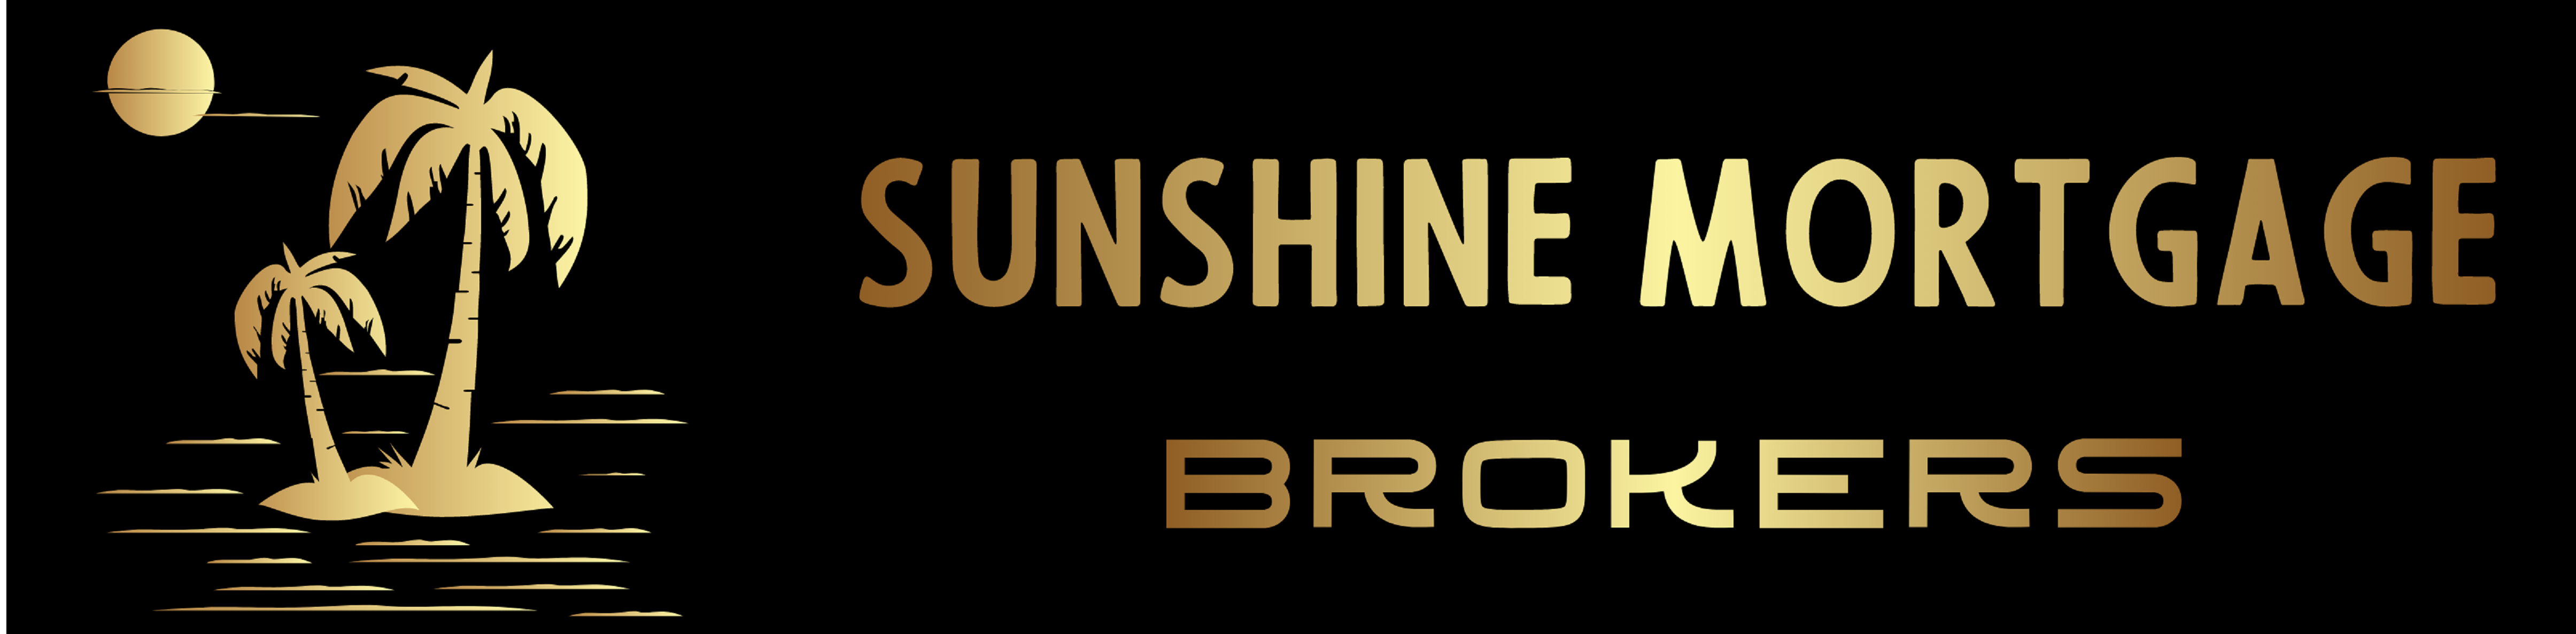 Sunshine Mortgage Brokers